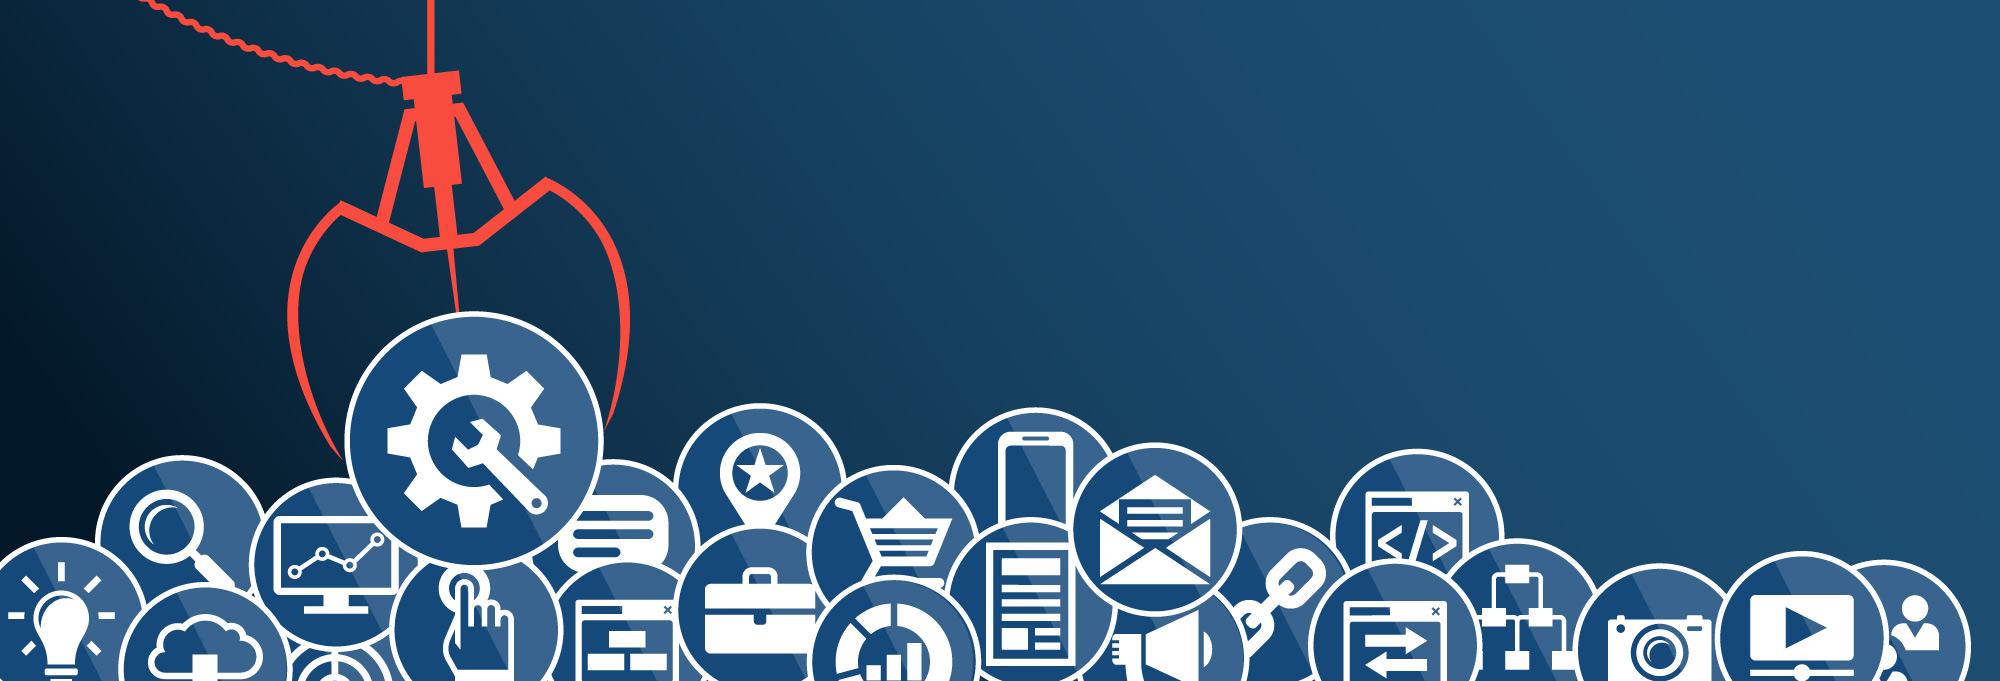 webdesign-slide2